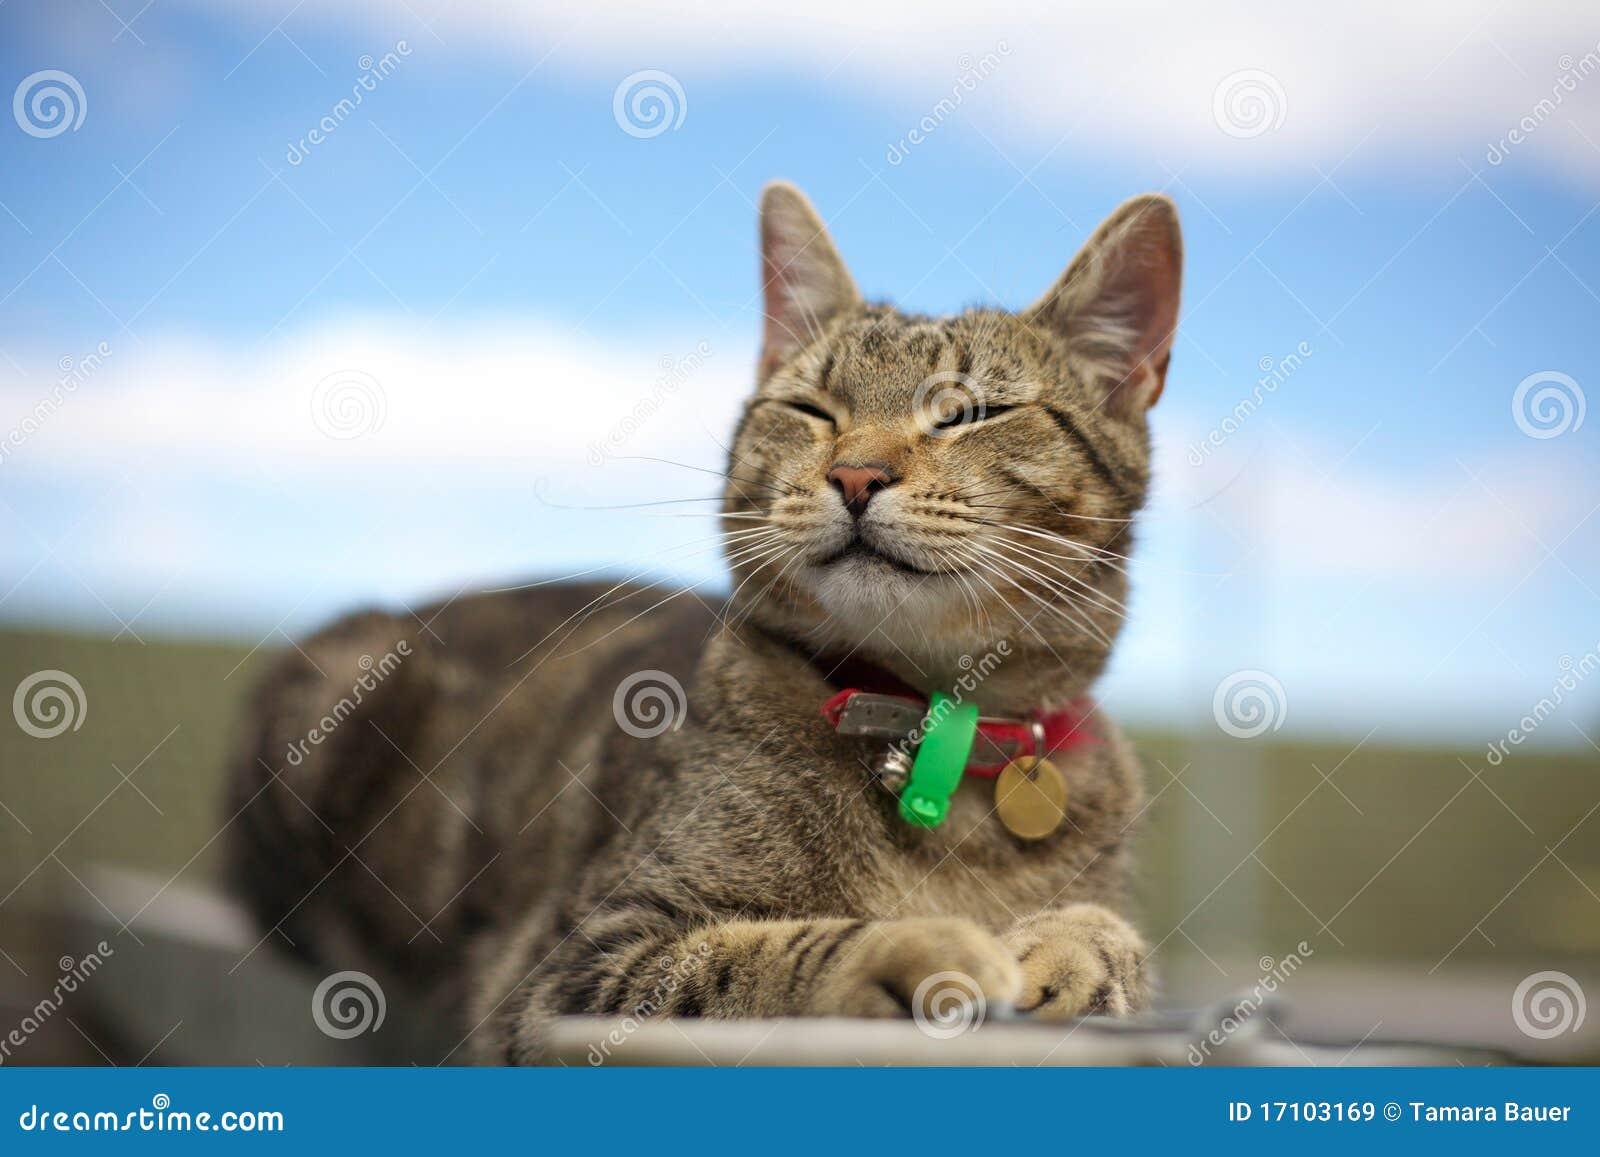 Smiling tabby cat